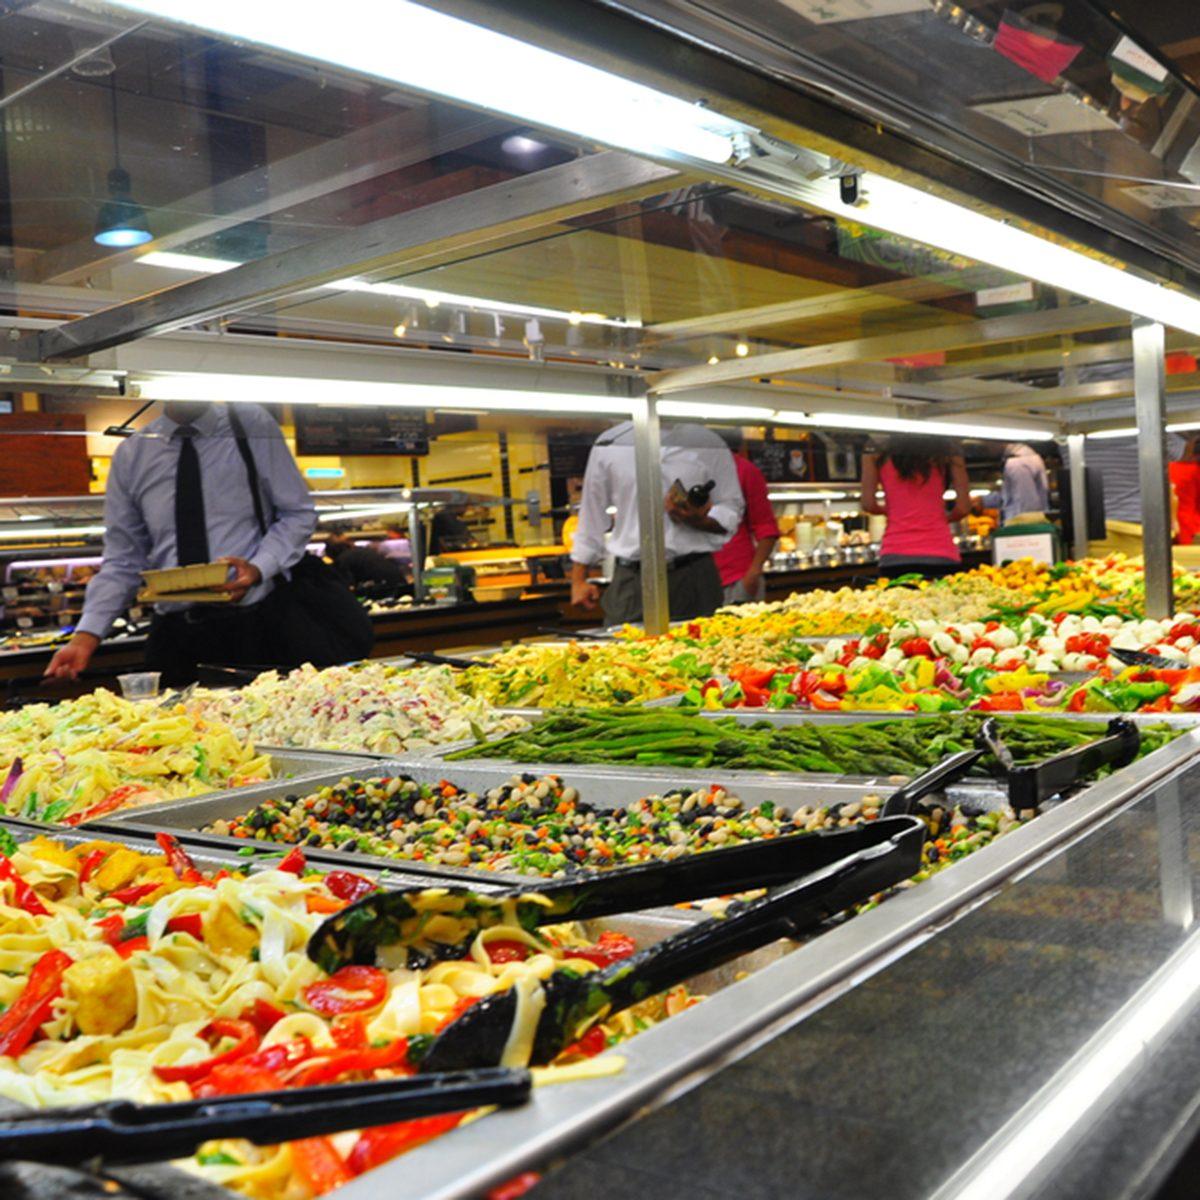 American supermarket.